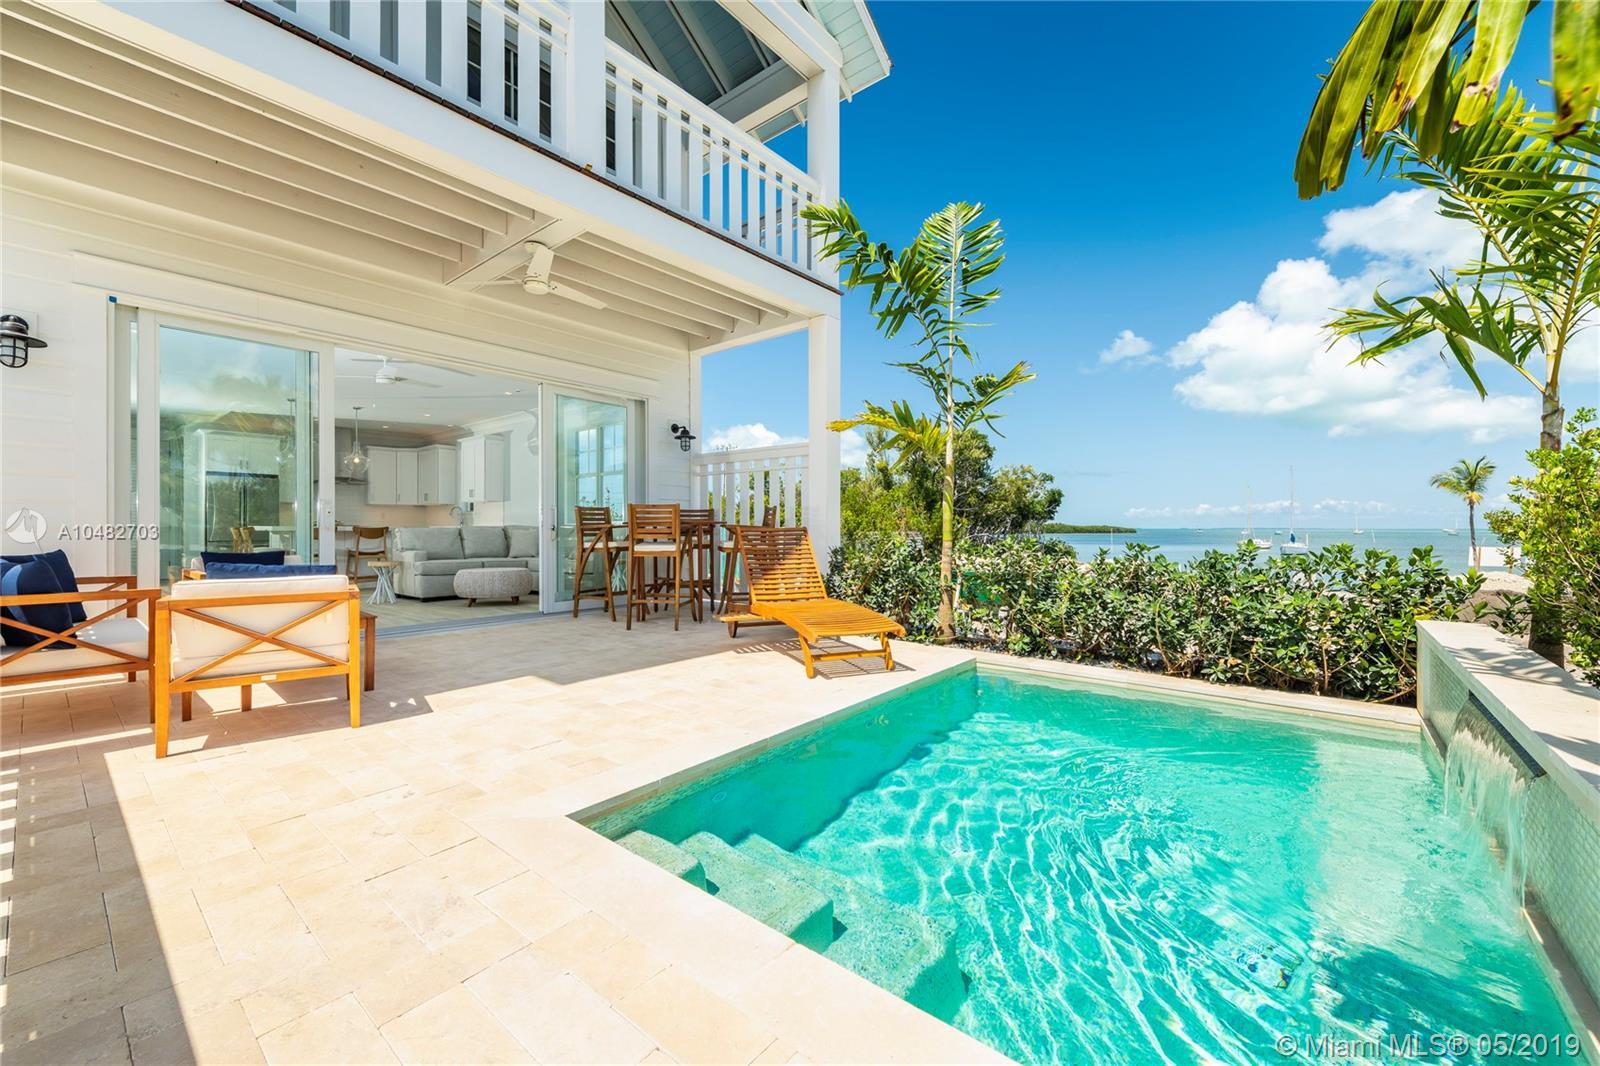 81906 #5 Overseas, Other City - Keys/Islands/Caribbean FL 33036